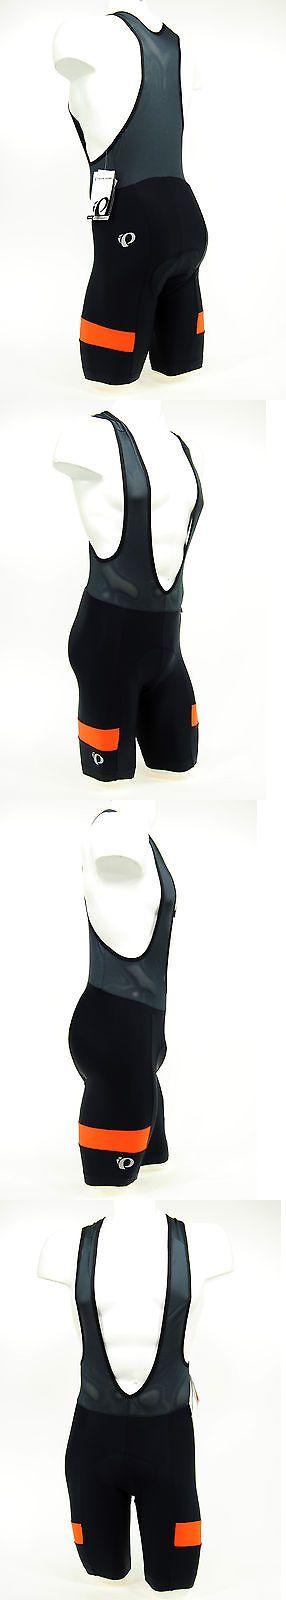 Shorts 177853: Pearl Izumi 2017 Escape Quest Splice Bike Cycling Bib Shorts Black/Orange,Medium BUY IT NOW ONLY: $49.87